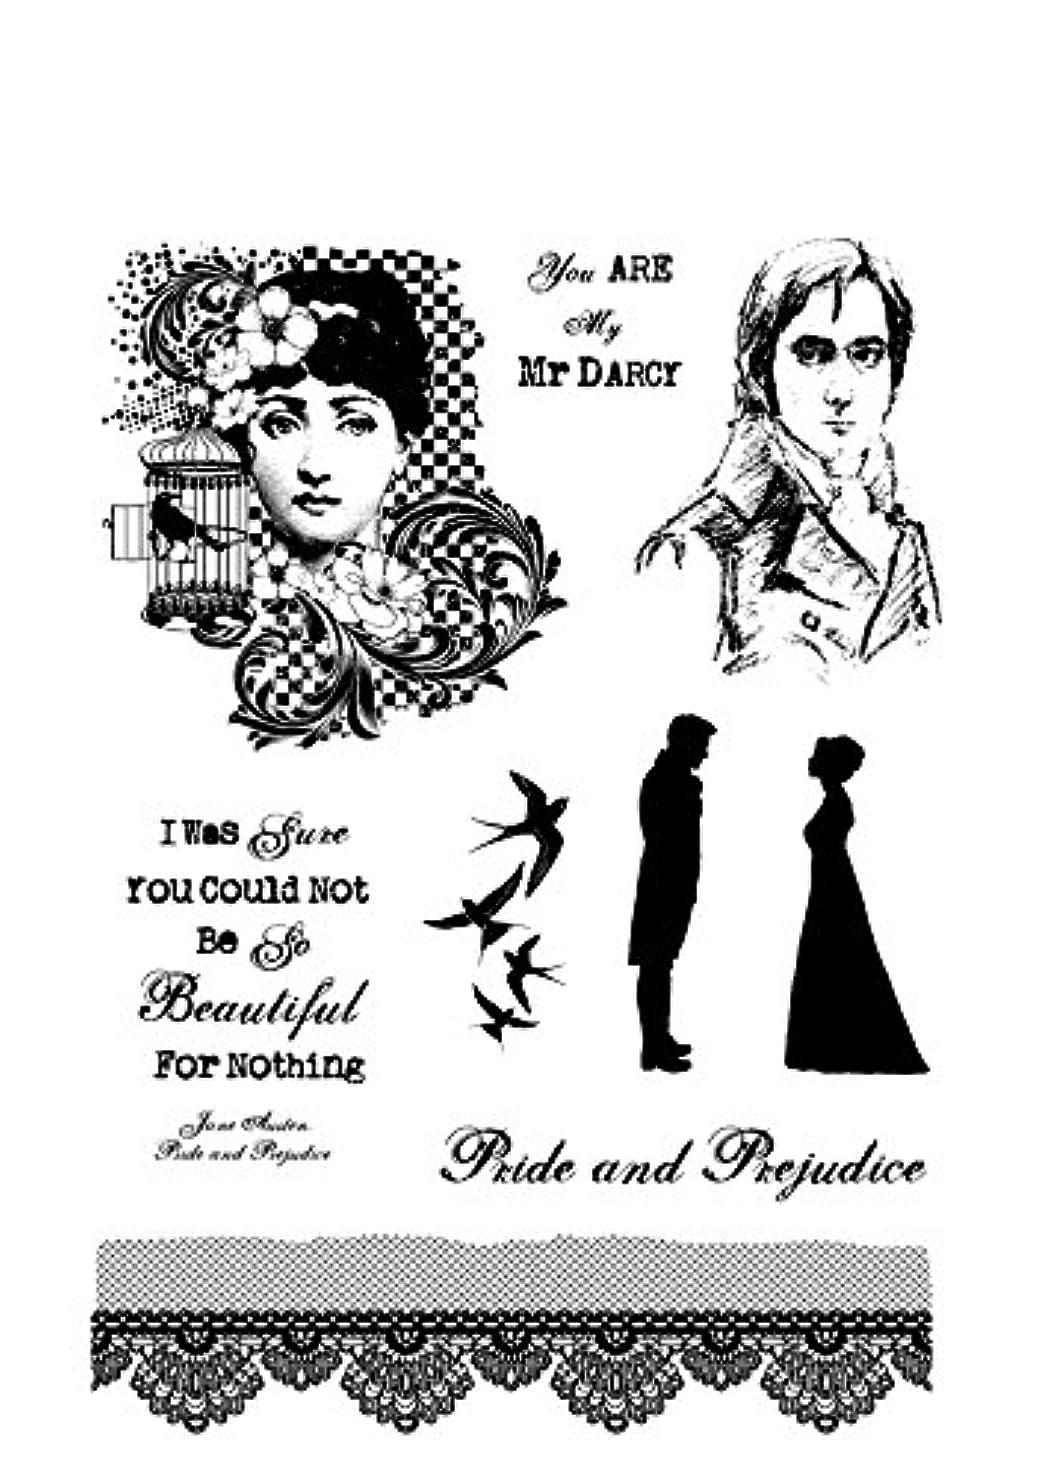 IndigoBlu MDMTD Cling Mounted Stamp, 9.25 by 6.25-Inch, Mr. Darcy